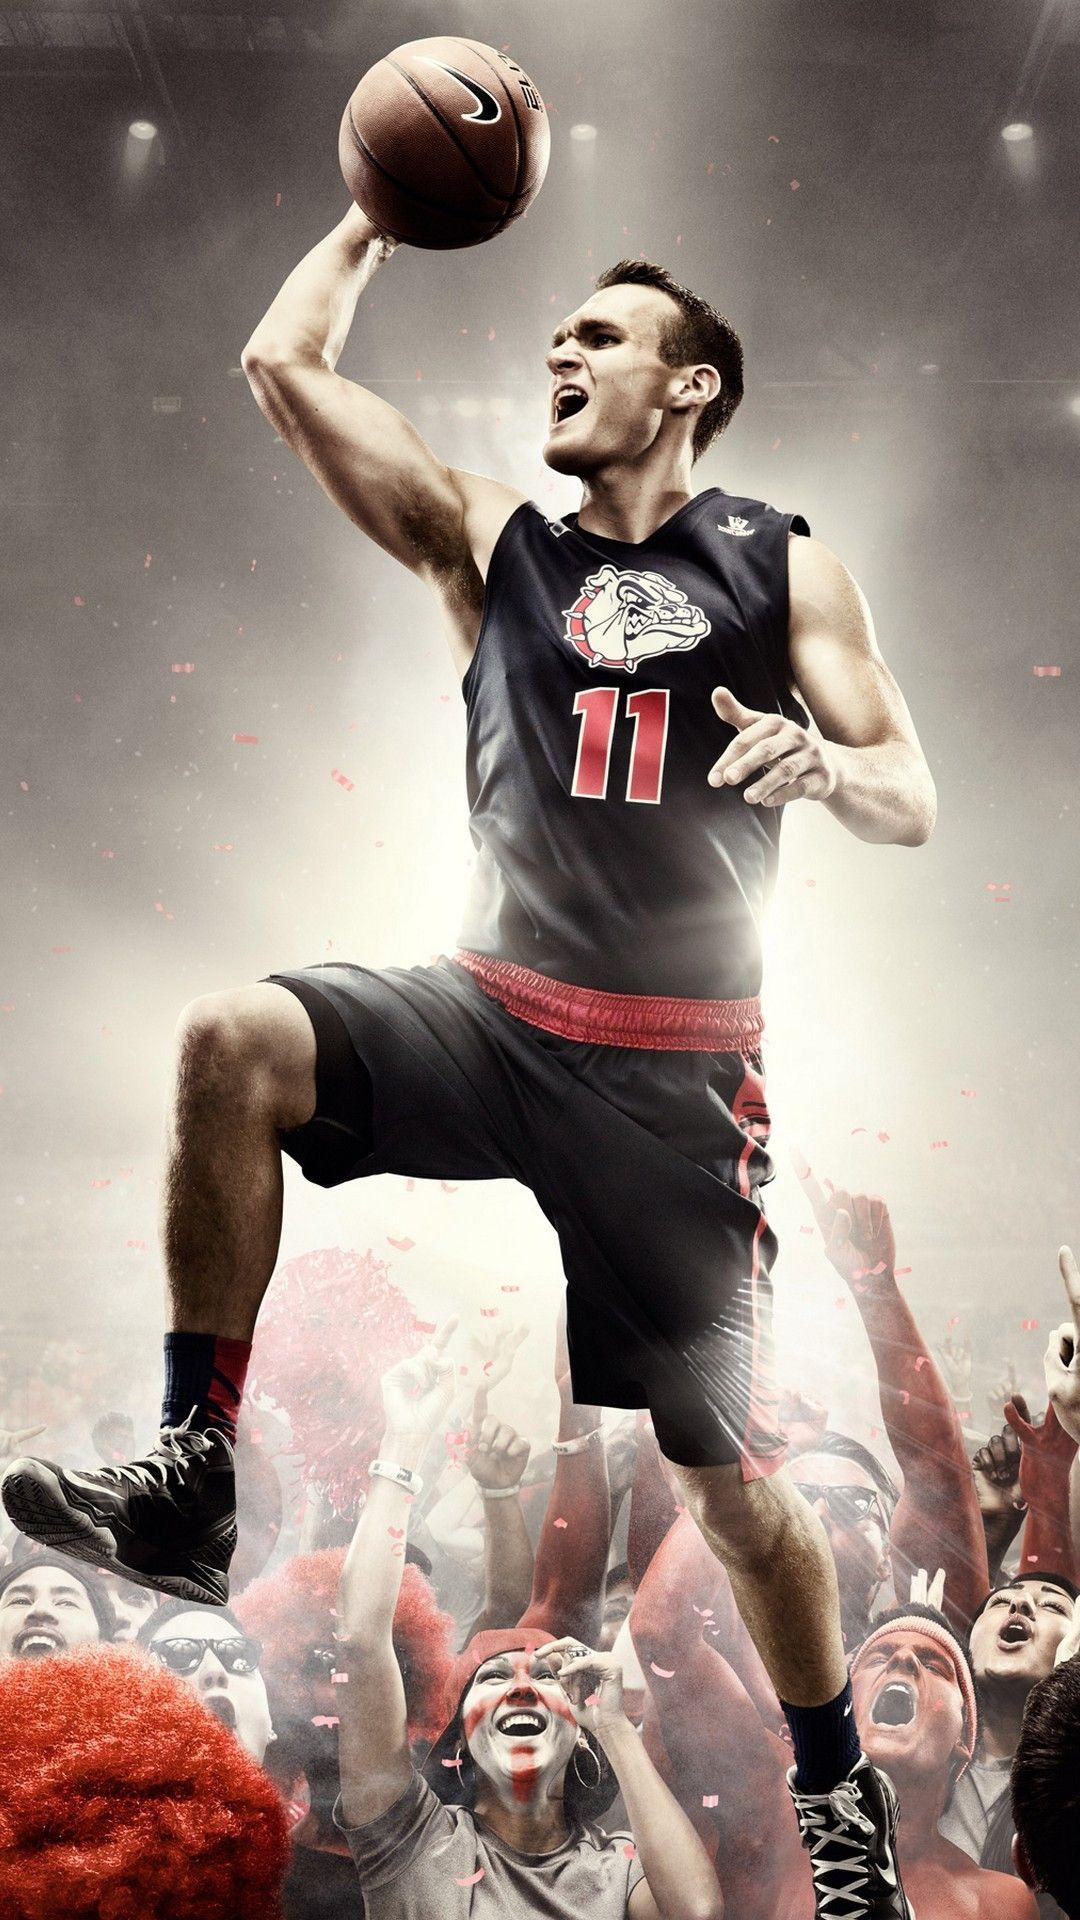 NBA Backgrounds For Mobile 2020 Basketball Wallpaper